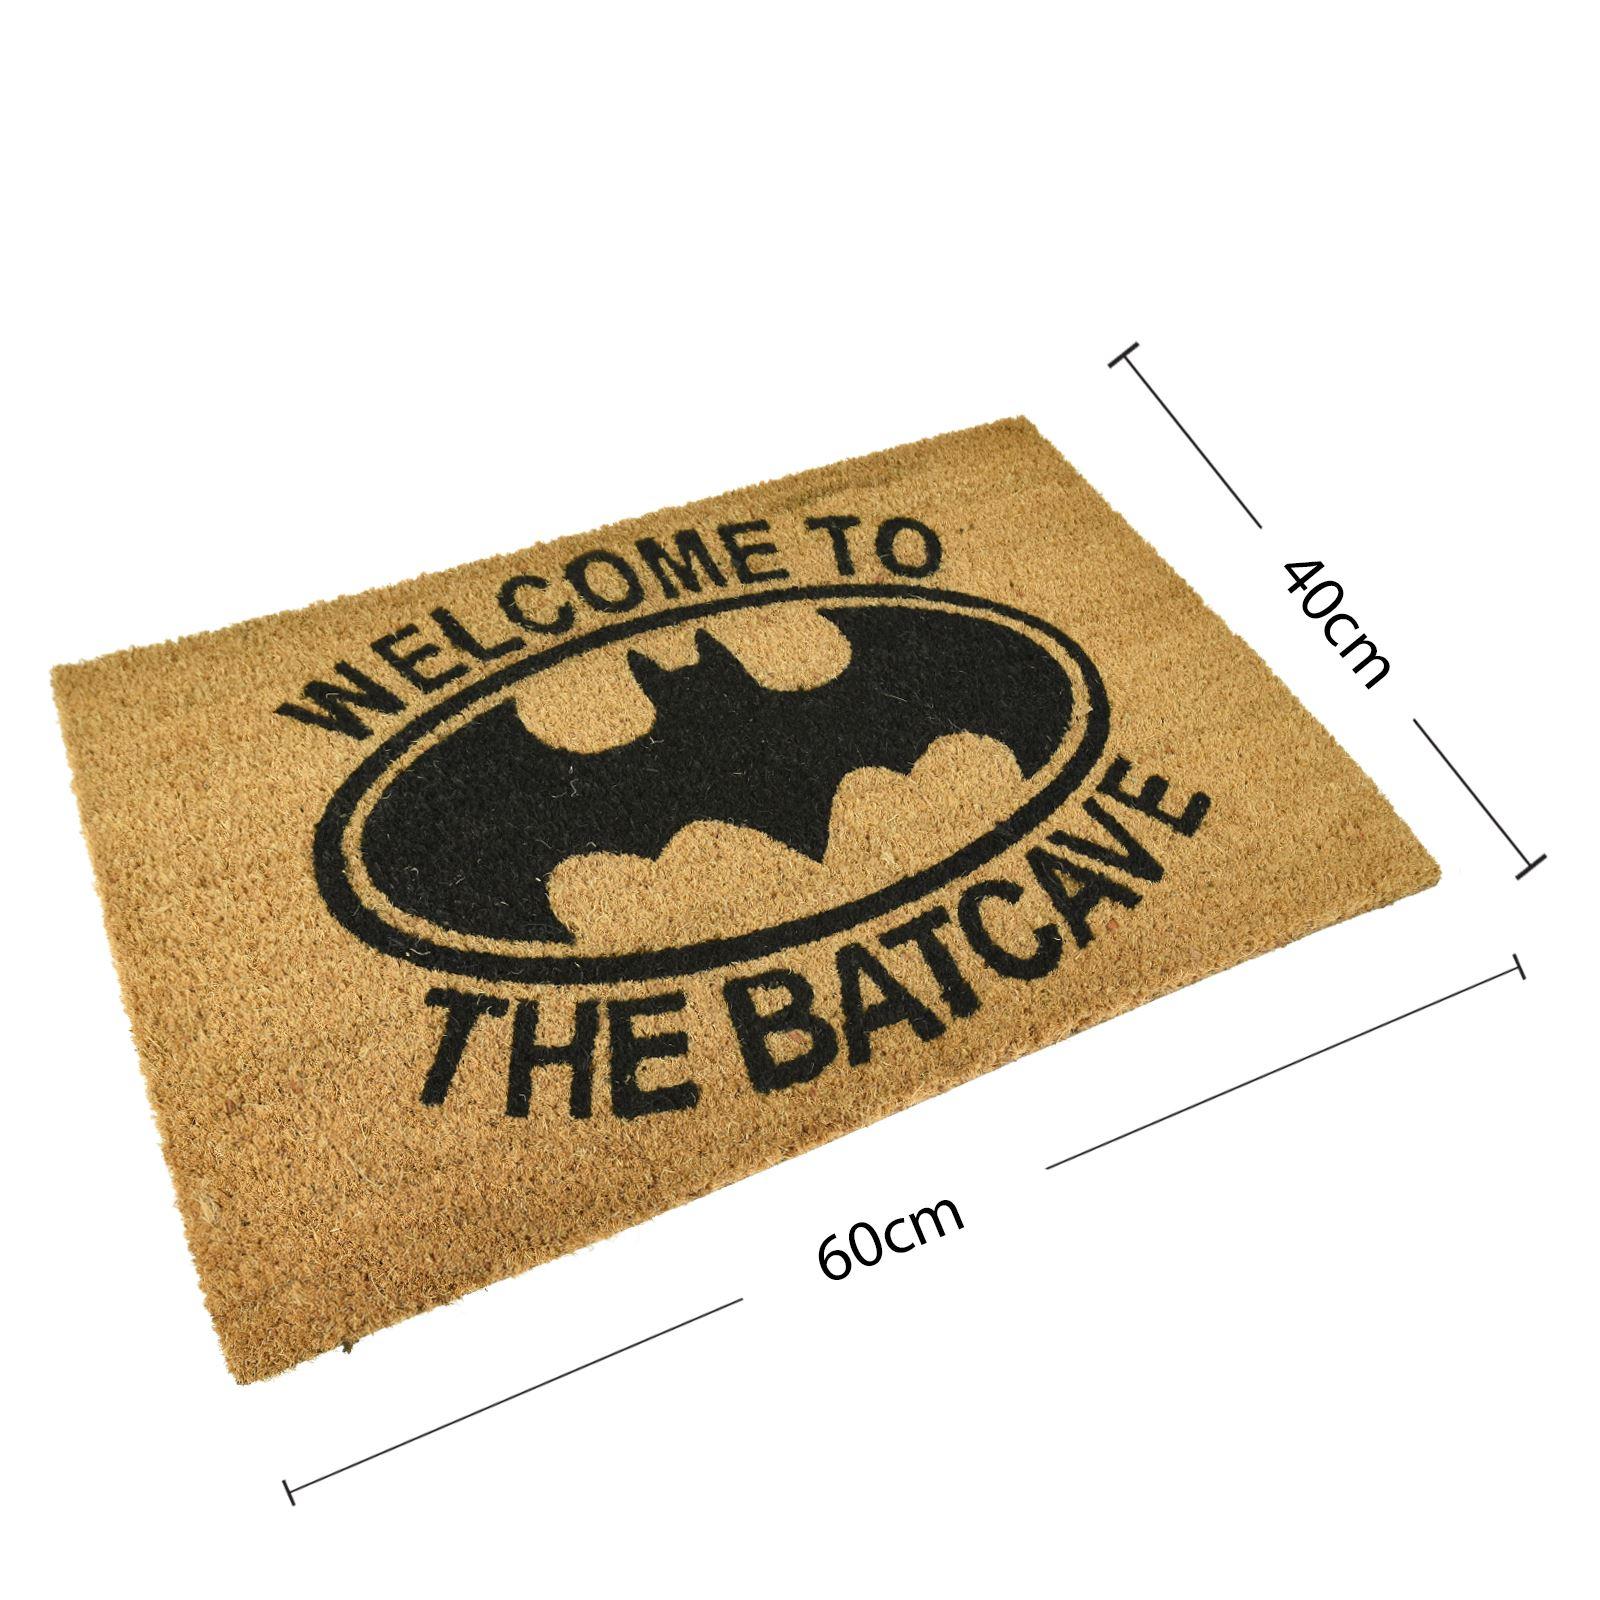 Plain-Non-Slip-Door-Mat-Tough-Natural-Coir-PVC-Back-Welcome-Doormat-40-x-60cm miniatura 7